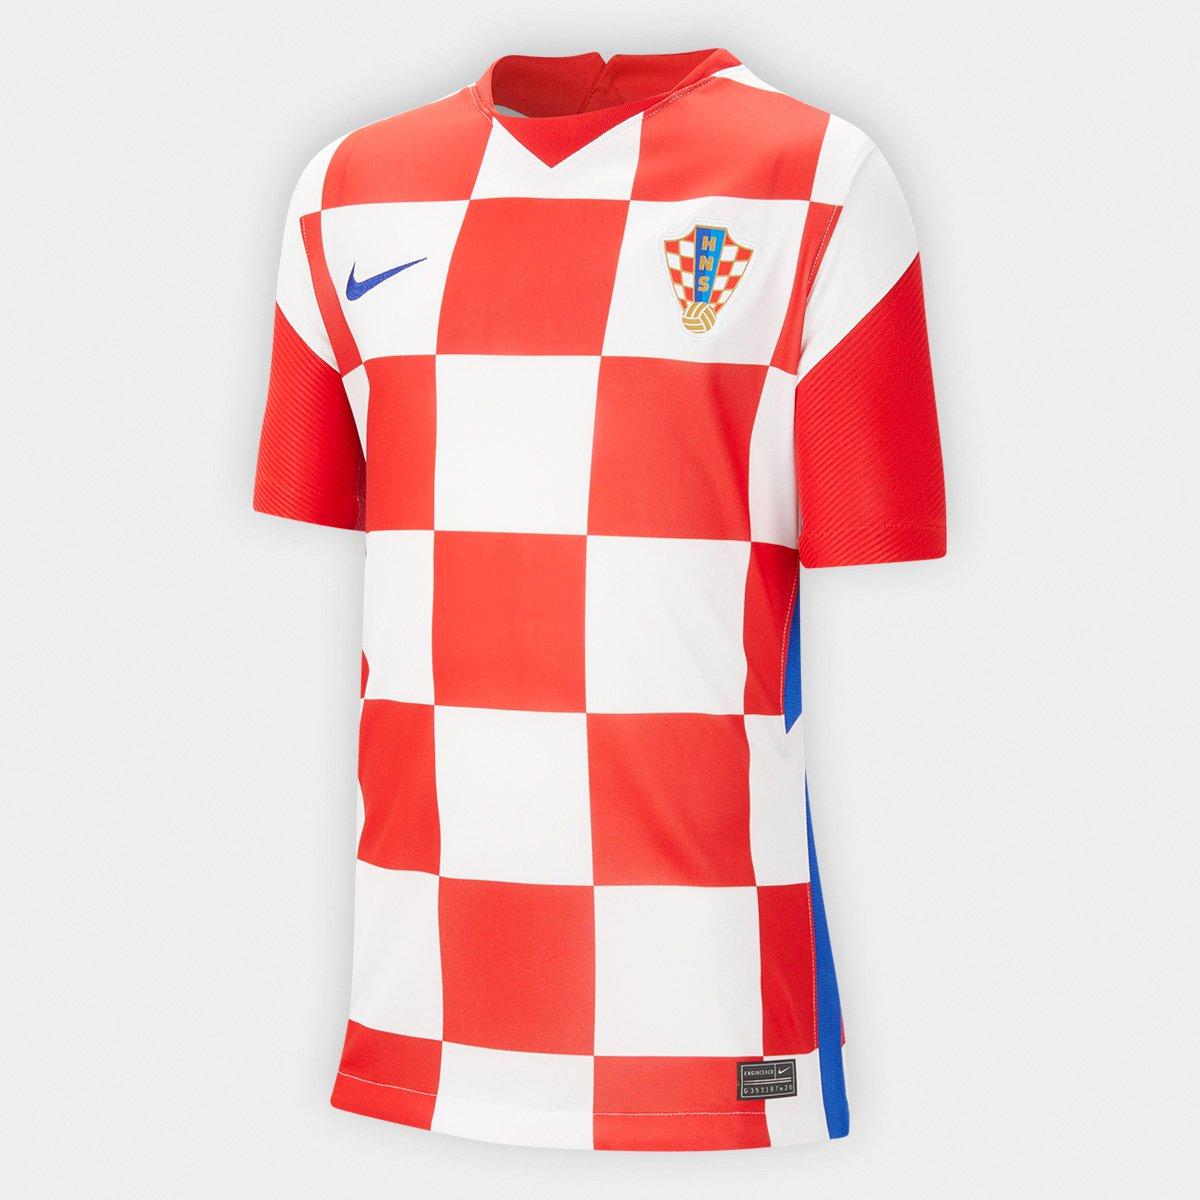 Camisa Seleção Croácia Juvenil Home 20/21 s/n° Torcedor Nike